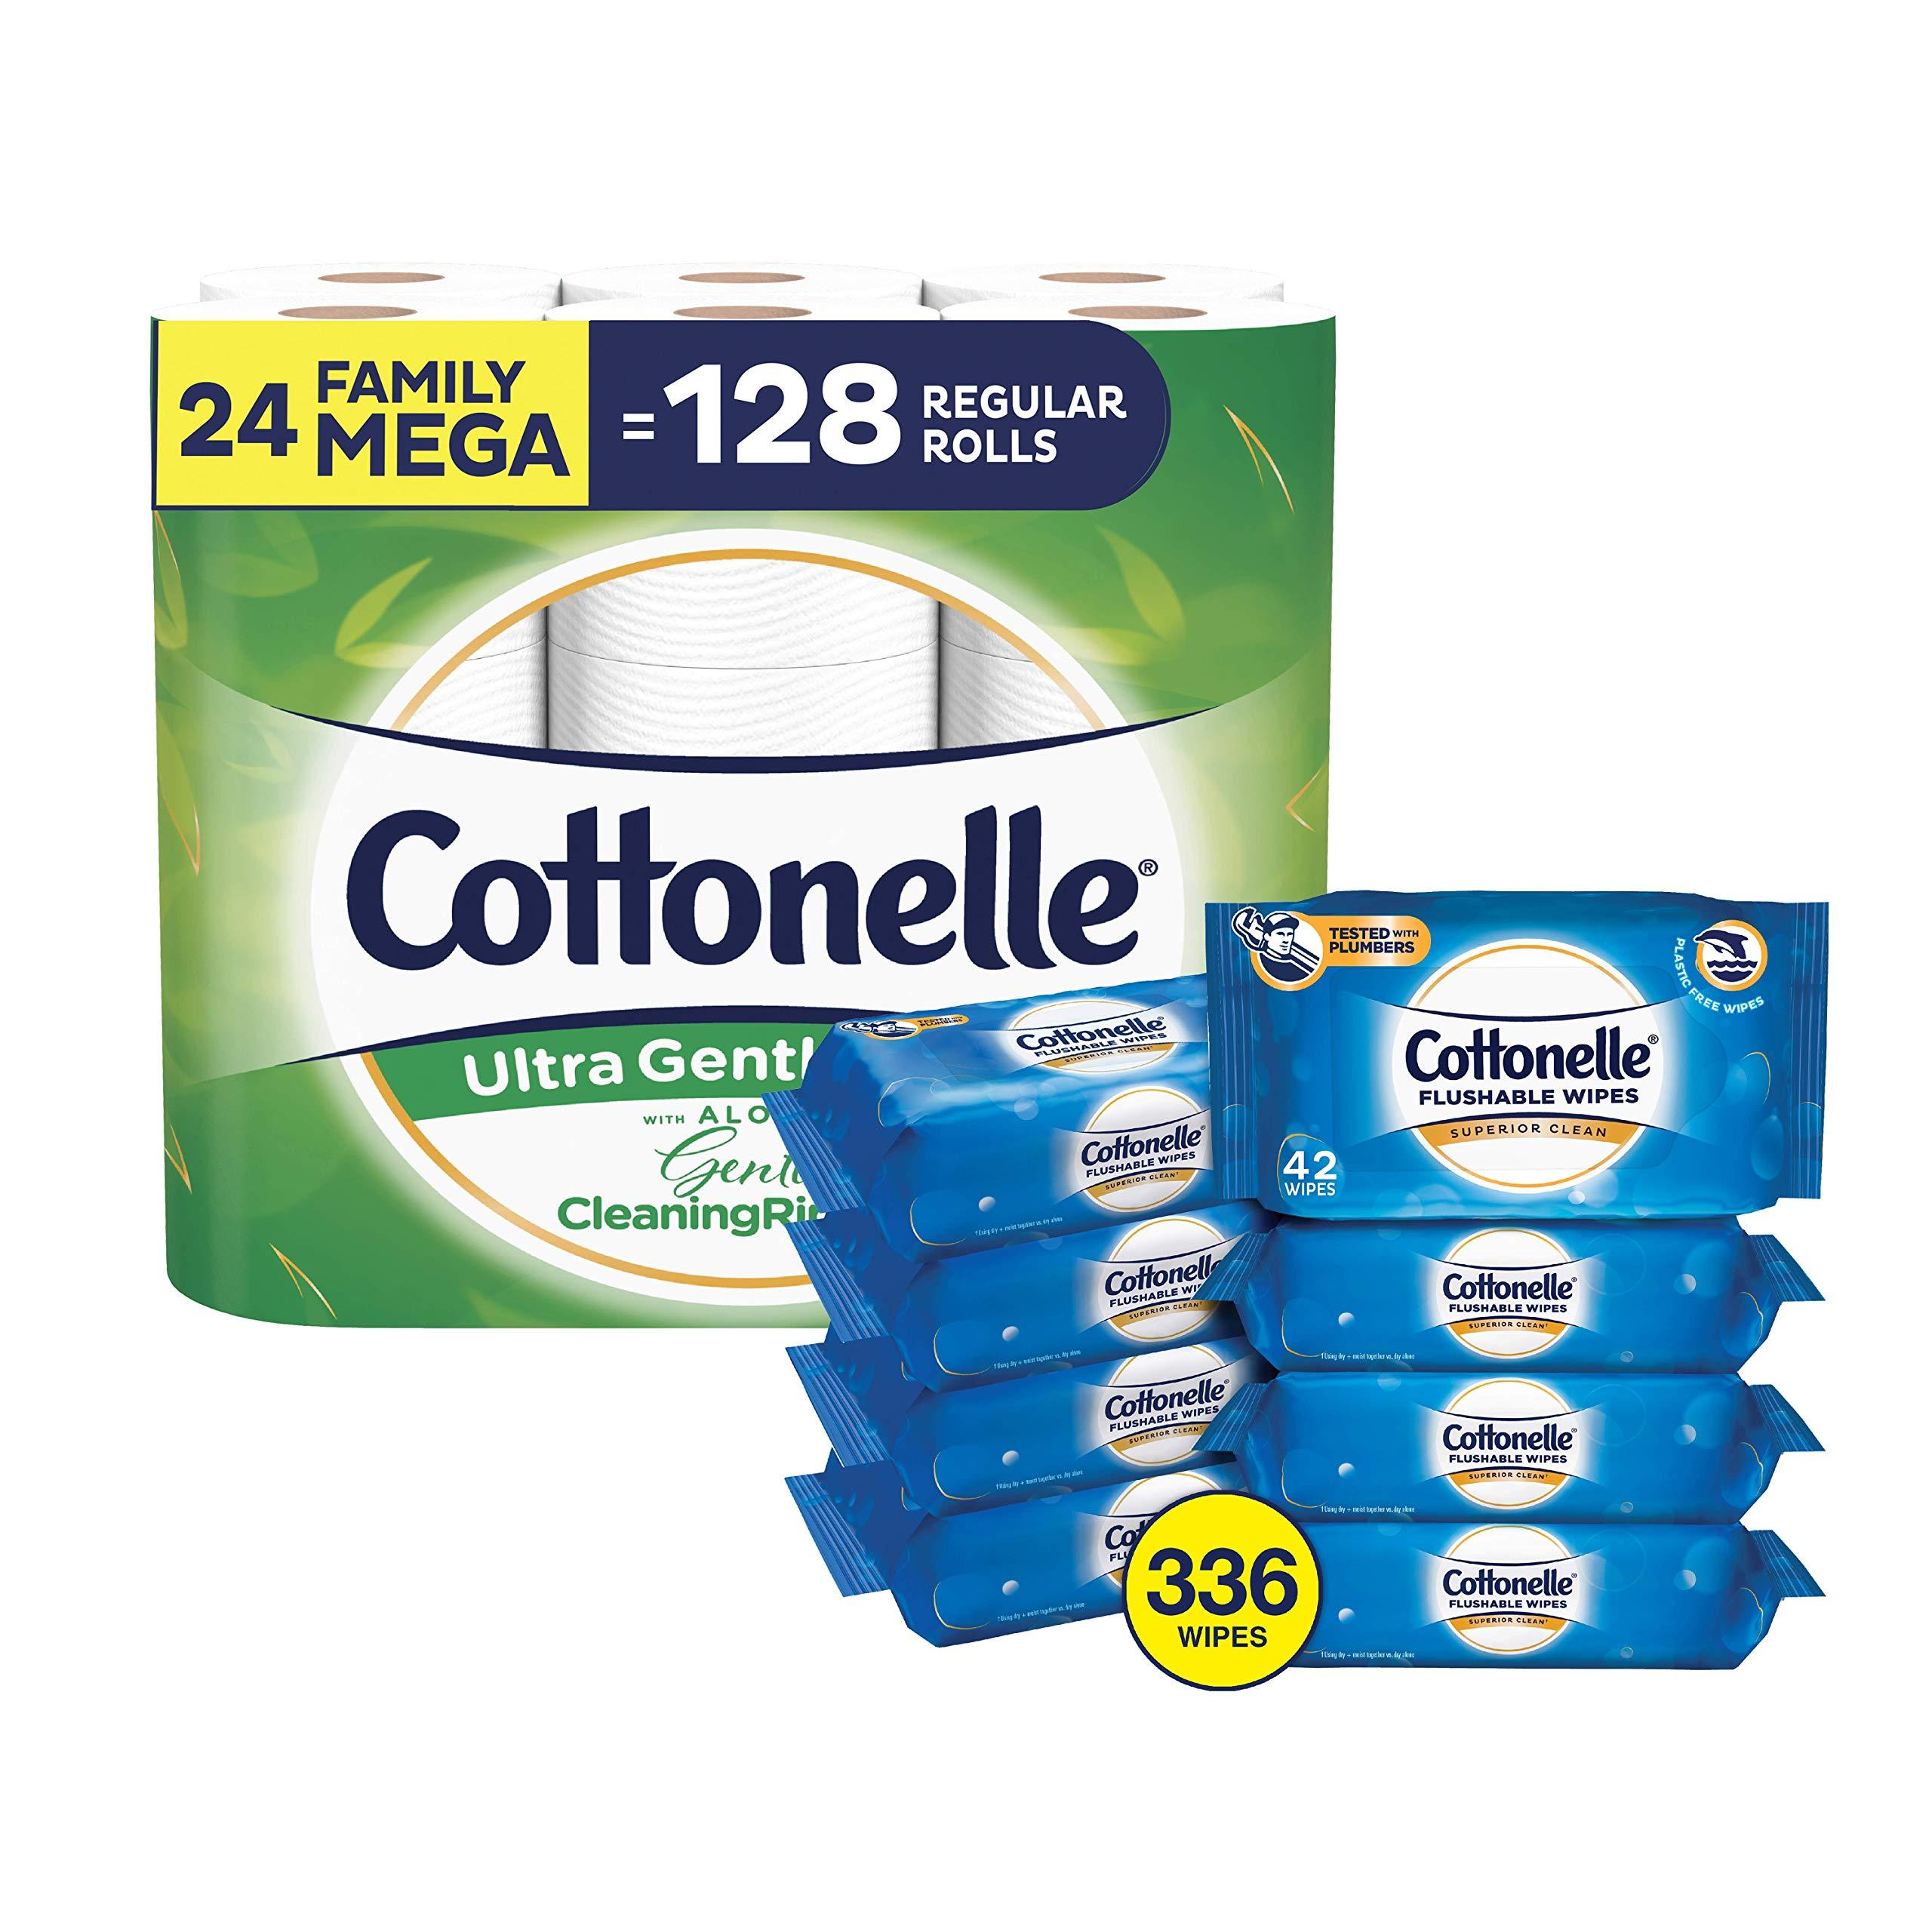 Cottonelle Toilet Paper Bundle - Cottonelle Ultra GentleCare Toilet Paper, 24 Mega Rolls and Cottonelle FreshCare Flushable Wipes, 8 Packs, 42 Wipes Per Pack (336 Wipes Total)